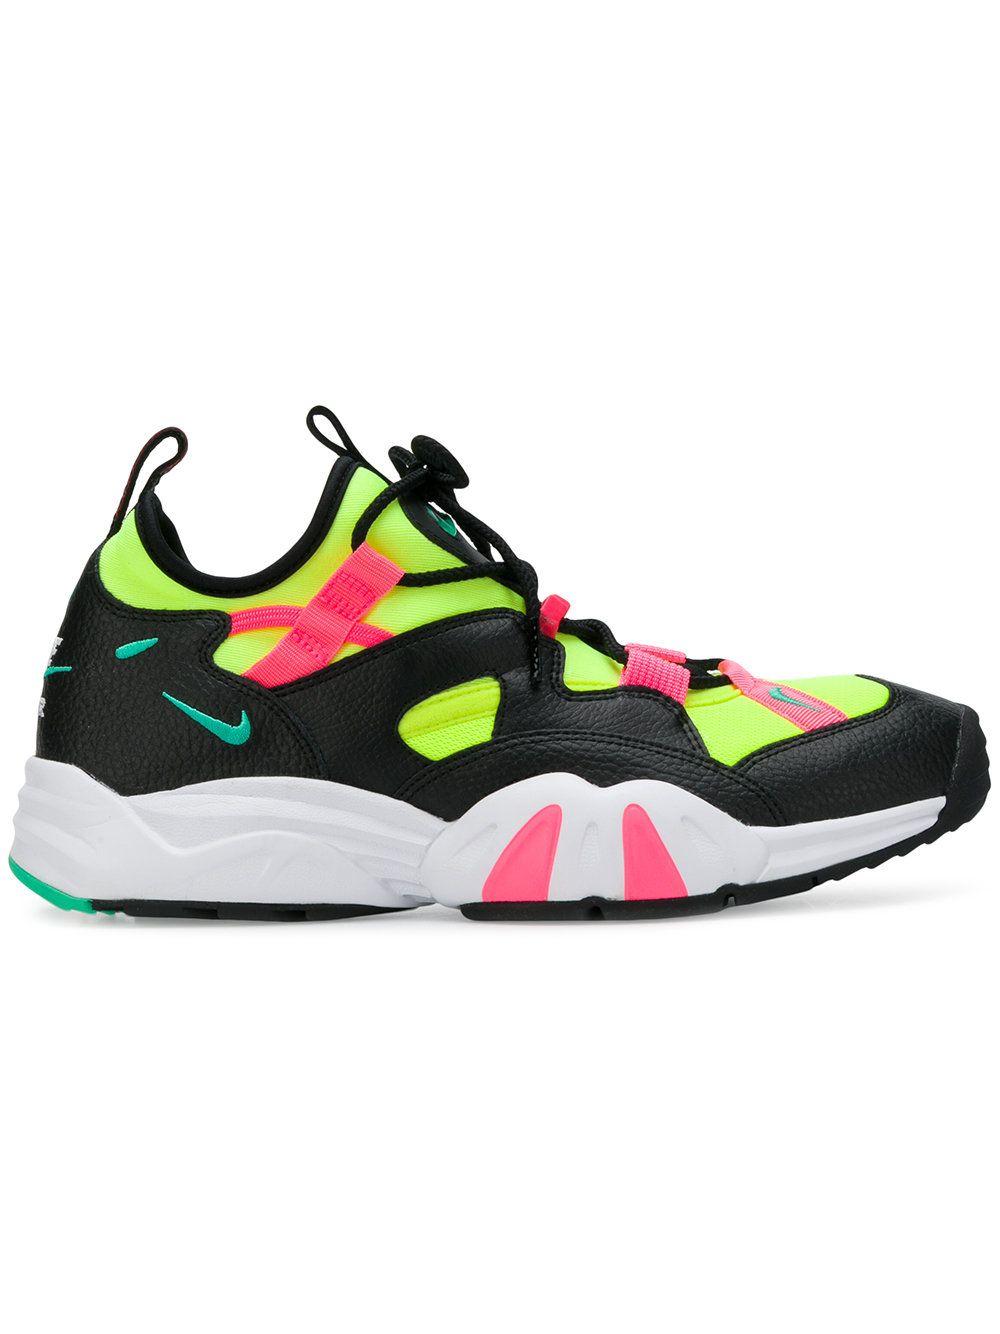 the best attitude 1b2cf 44188 Nike Air Scream Sneakers